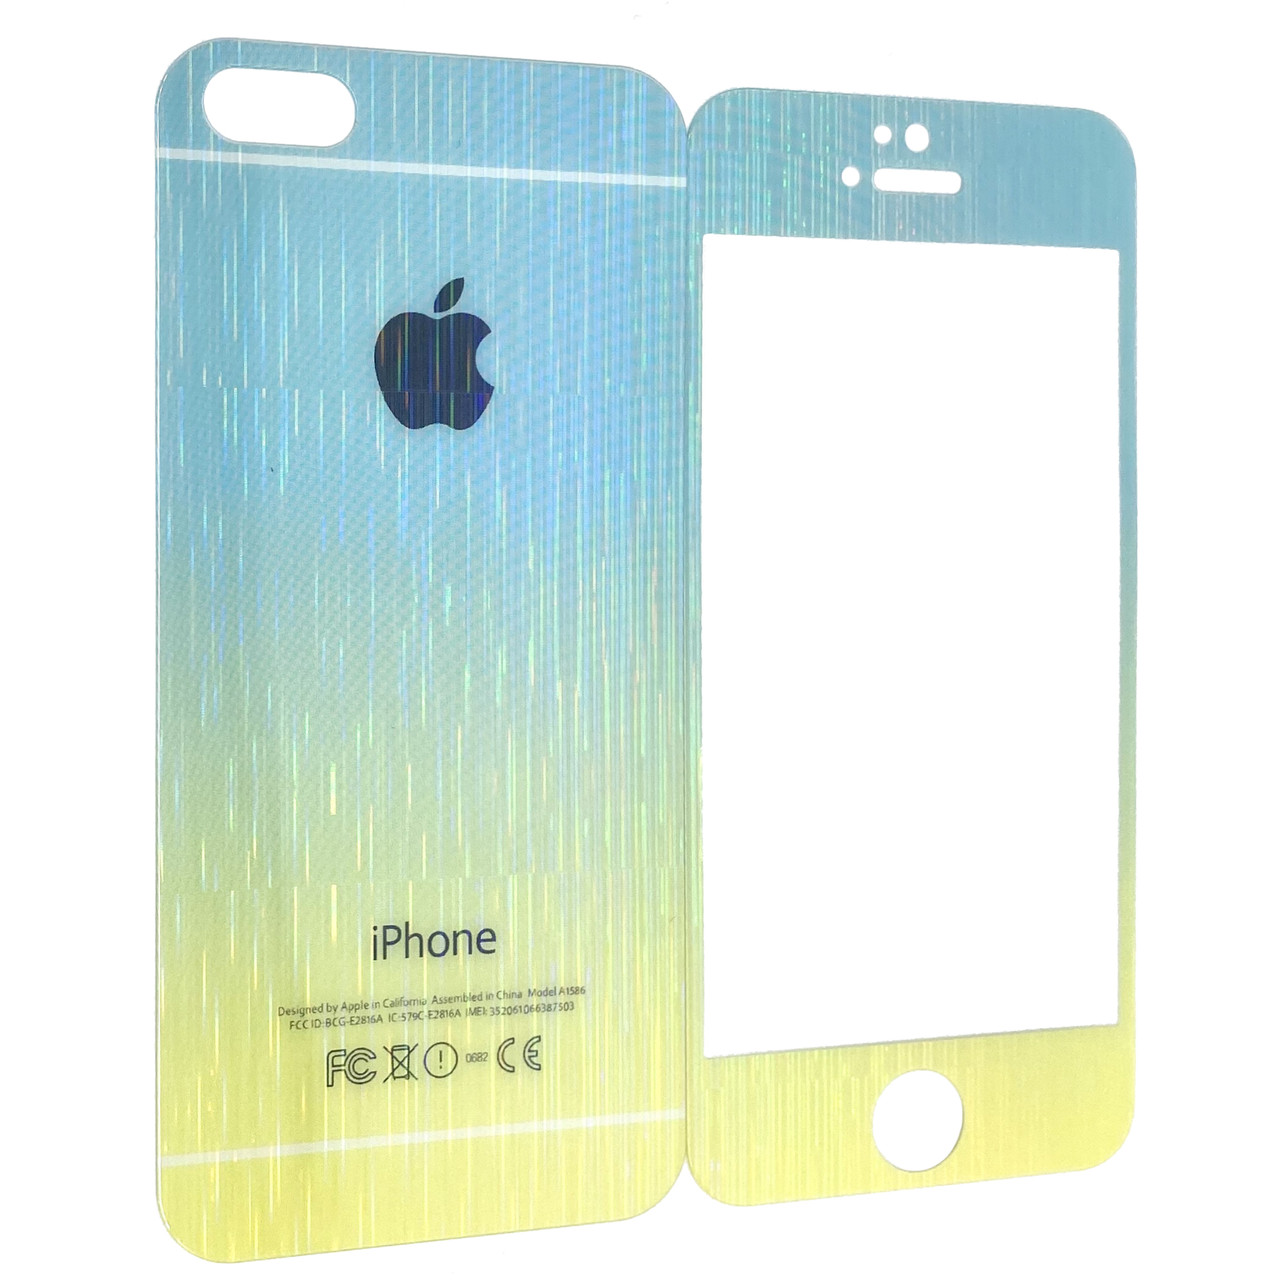 Защитное стекло Apple iPhone 5/5S радуга градиент back/face (yellow/blue)